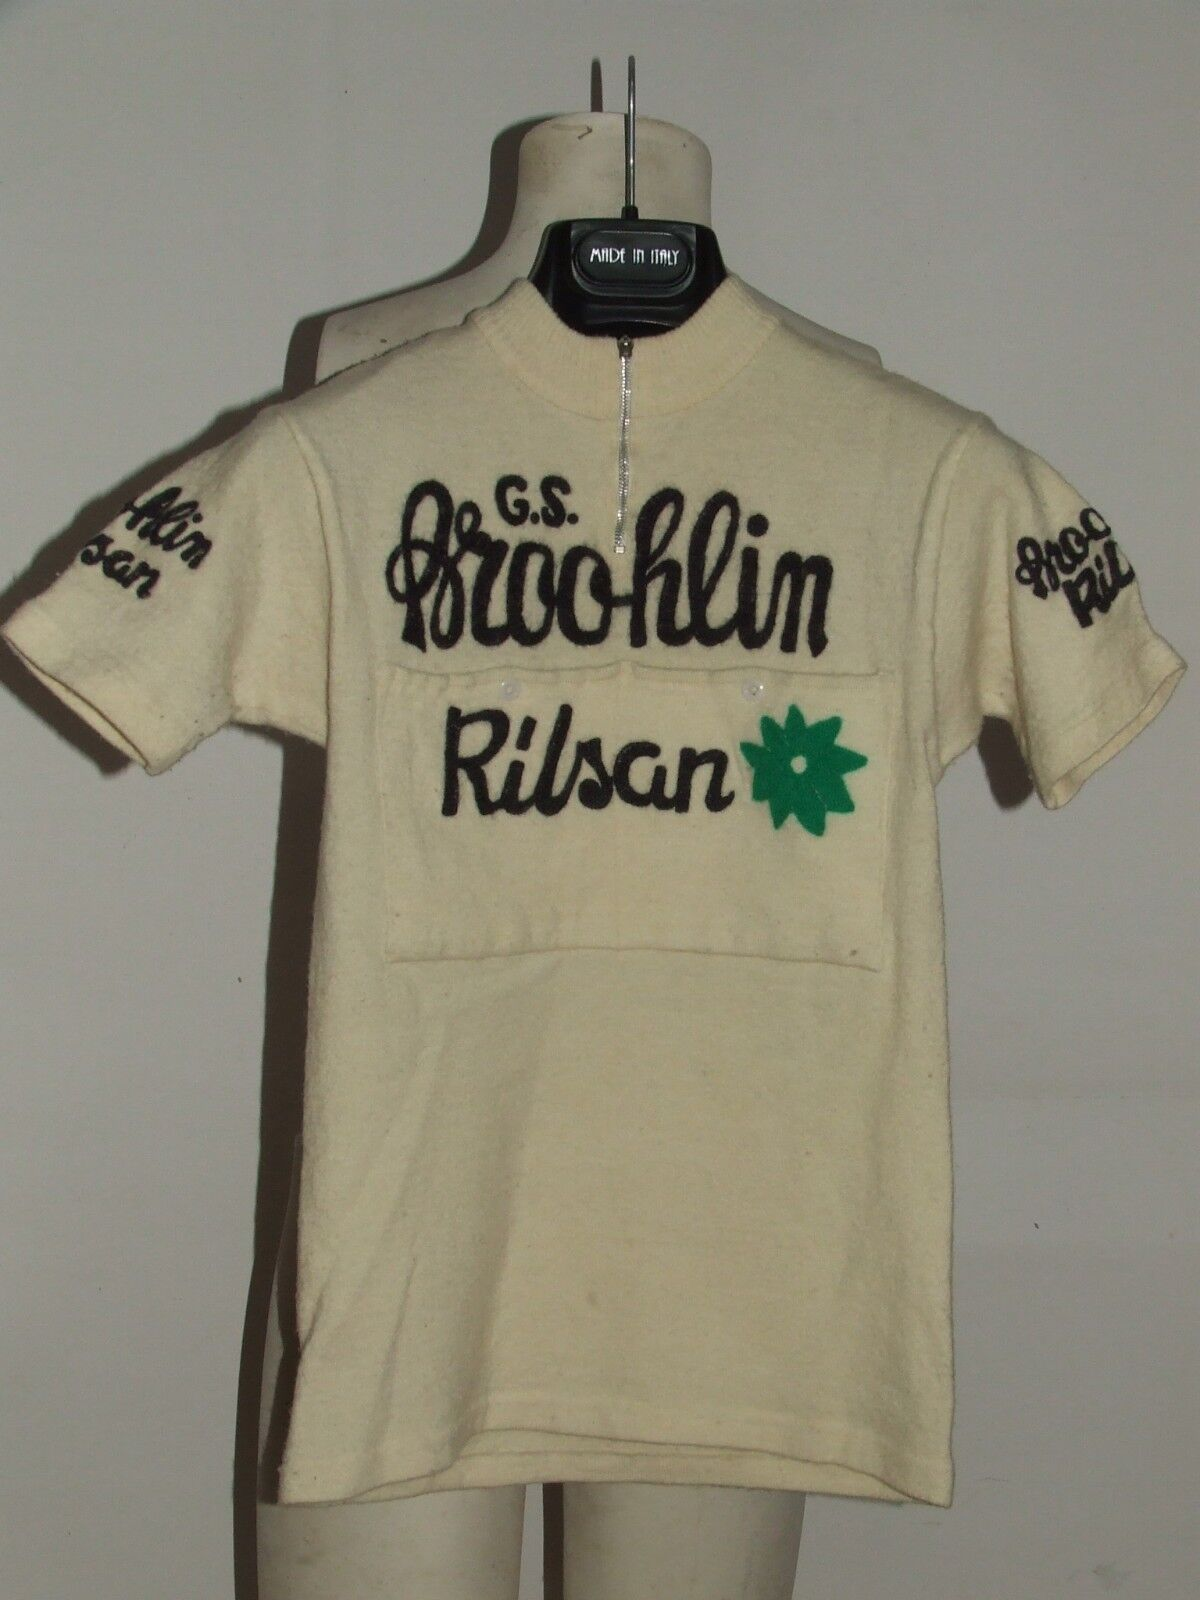 MAGLIA BICI CICLISMO EROICA  VINTAGE 70'S BROOKLIN RILSAN 1960 RICAMATA LANA  precios mas baratos